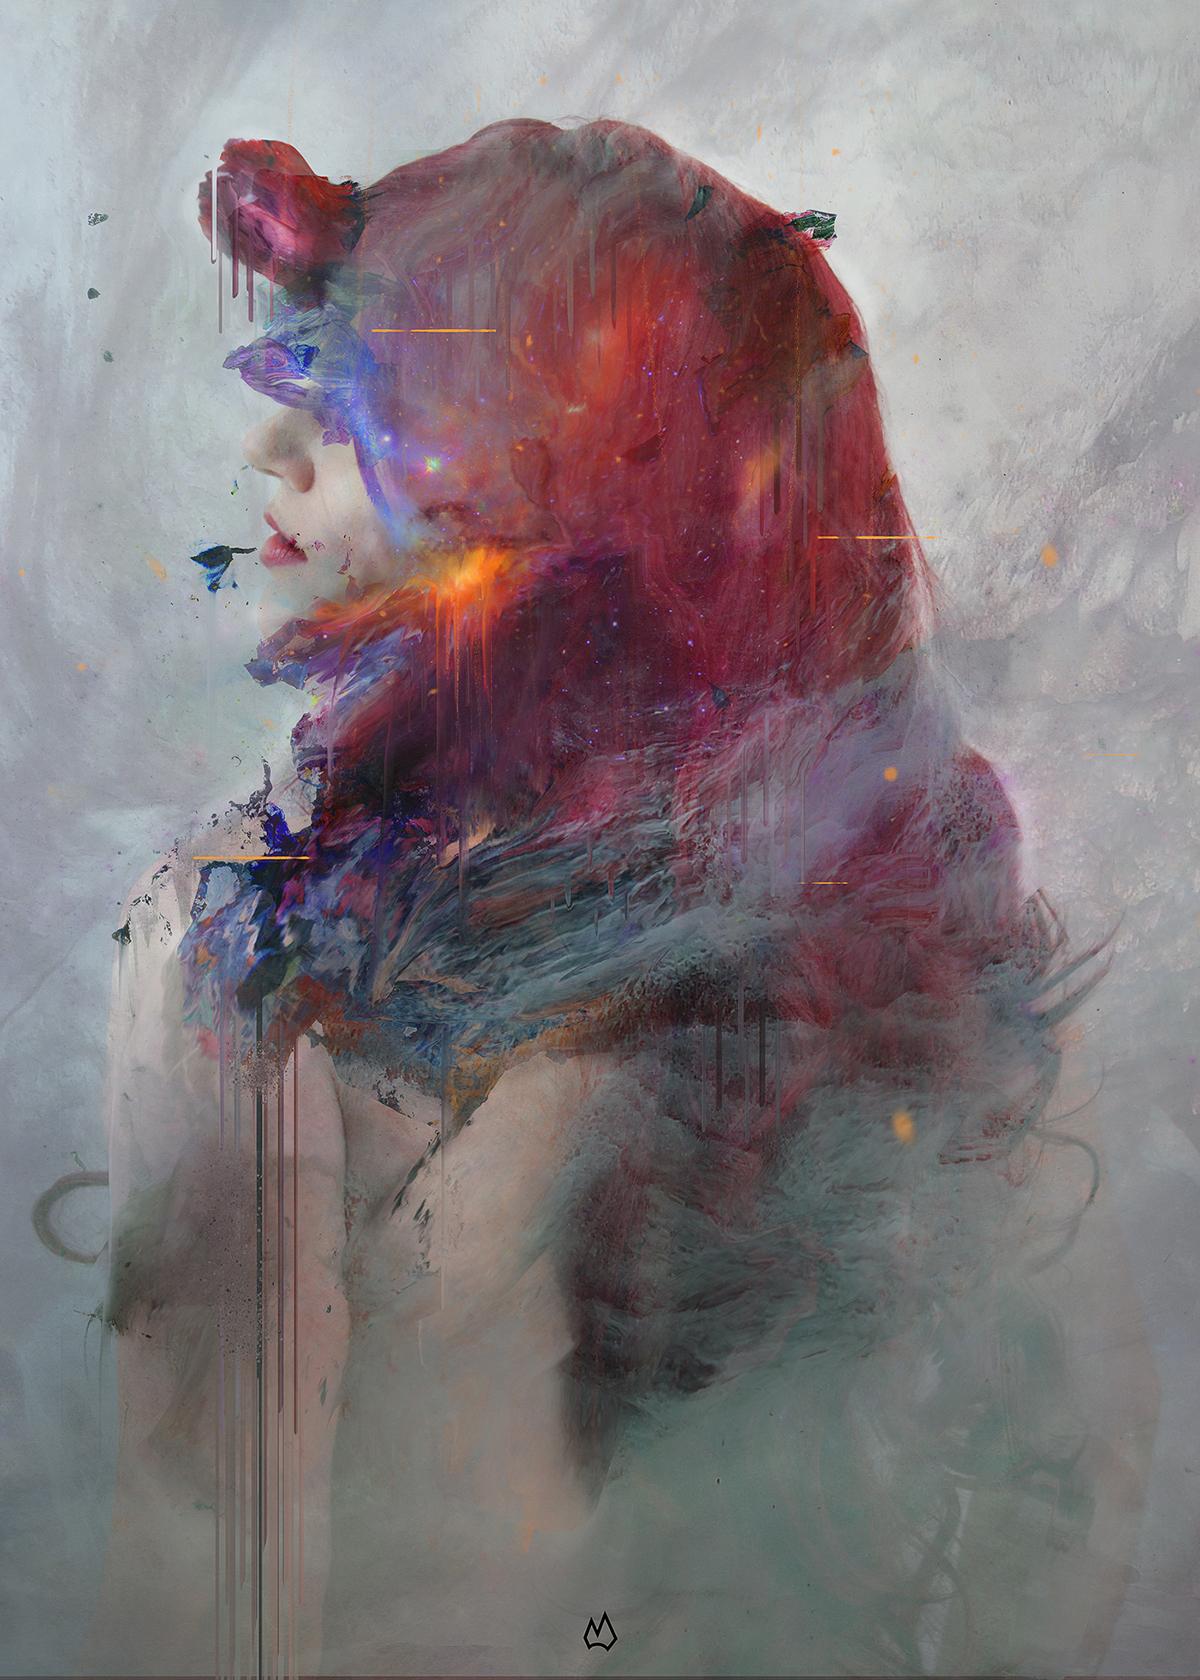 evolve art egypt digital Exhibition  piece artwork